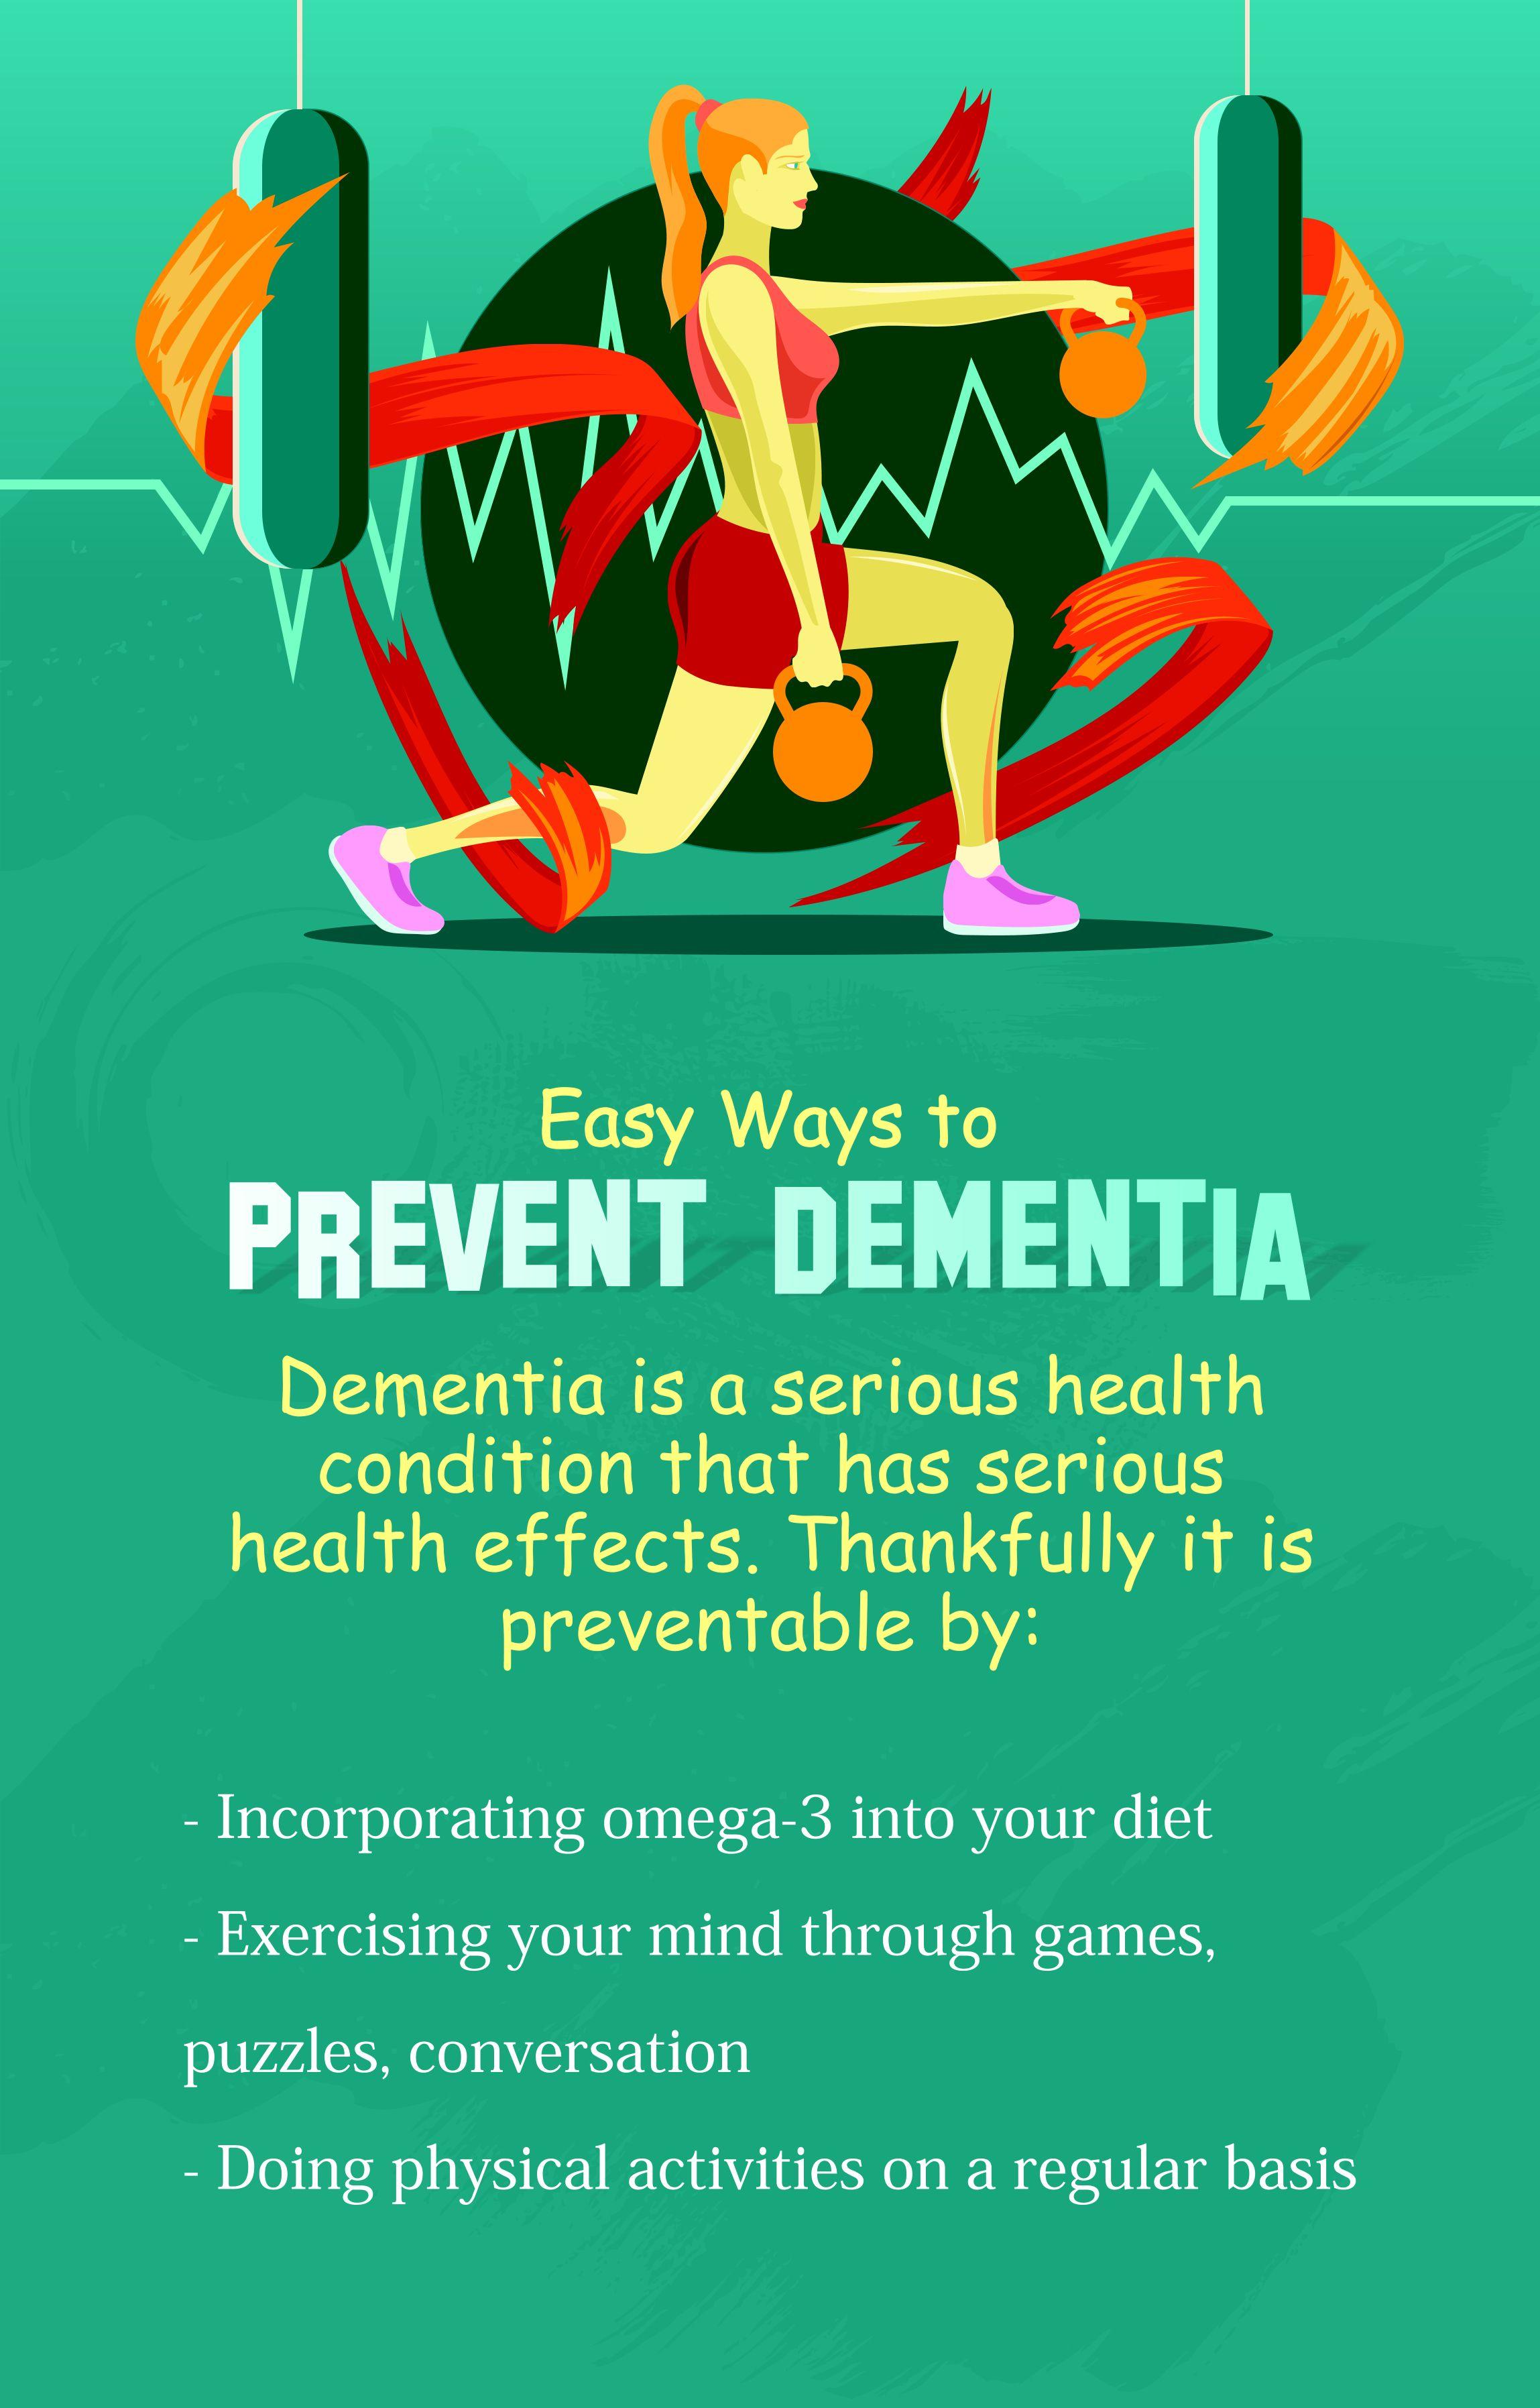 Easy ways to prevent dementia prevention dementia